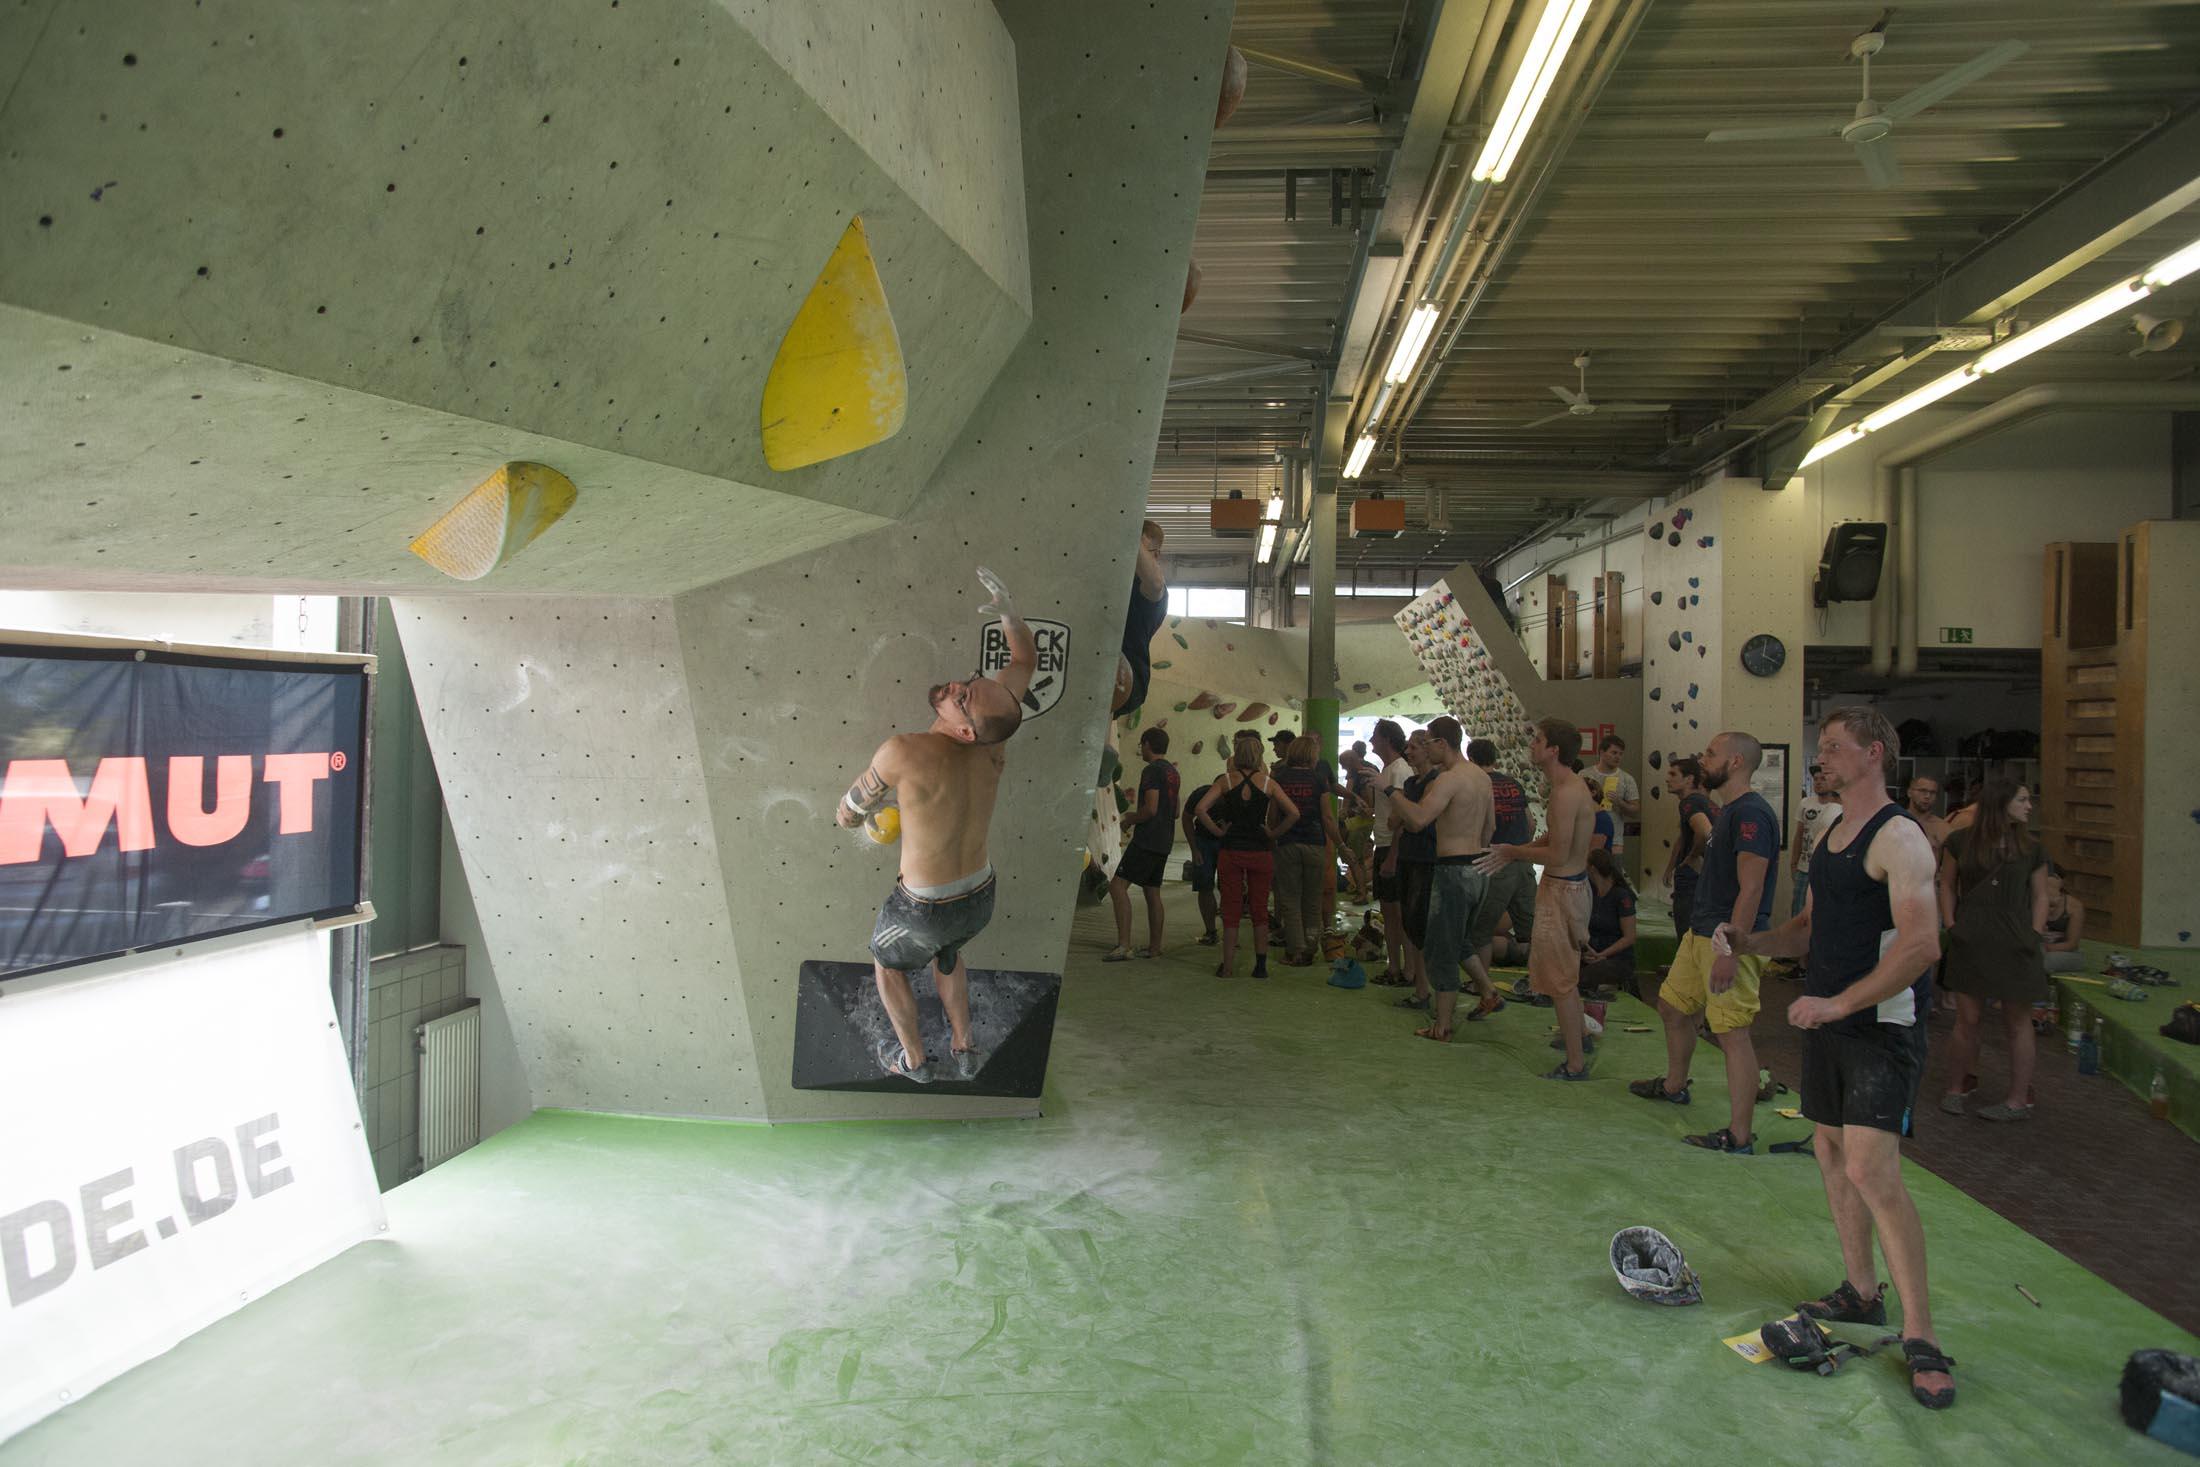 Quali, internationaler bouldercup Frankenjura 2016, BLOCKHELDEN Erlangen, Mammut, Bergfreunde.de, Boulderwettkampf07092016398